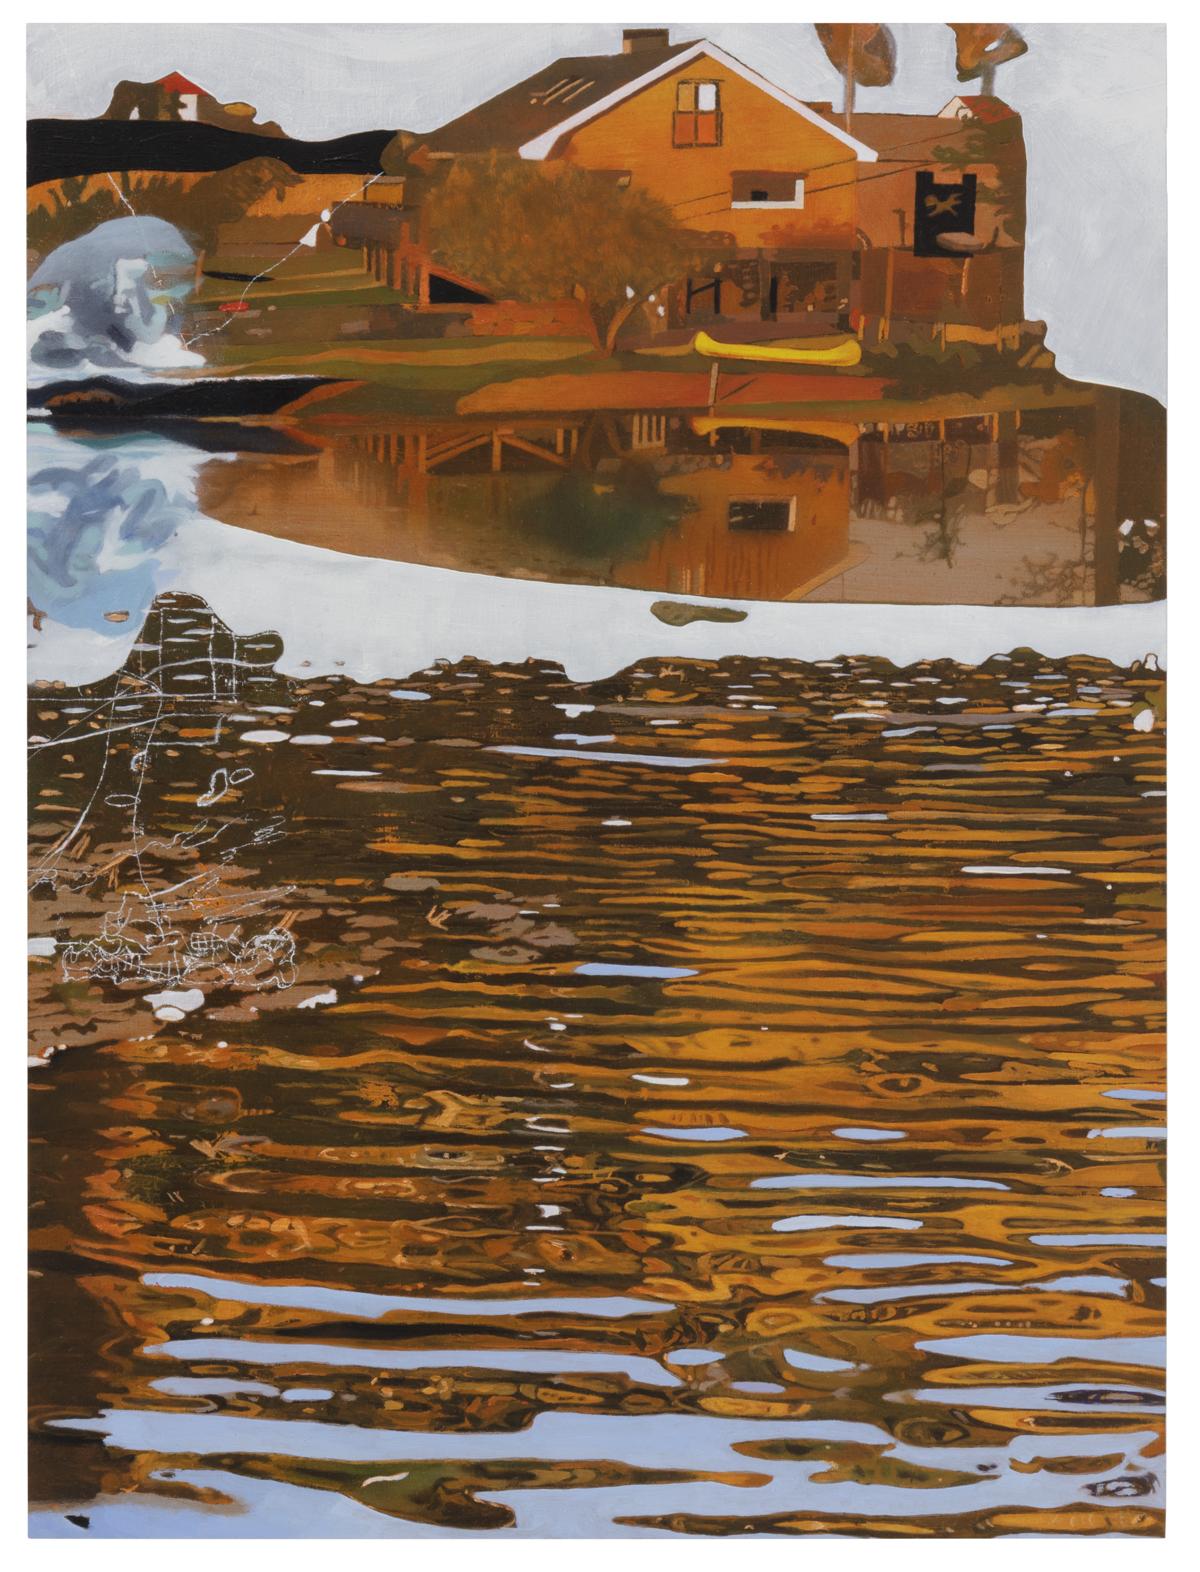 "Lisa D Manner,""Dagsmeja/Middaythwaw, "", 2020, oil on mdf, 40x30 cm, Galleri Flach"